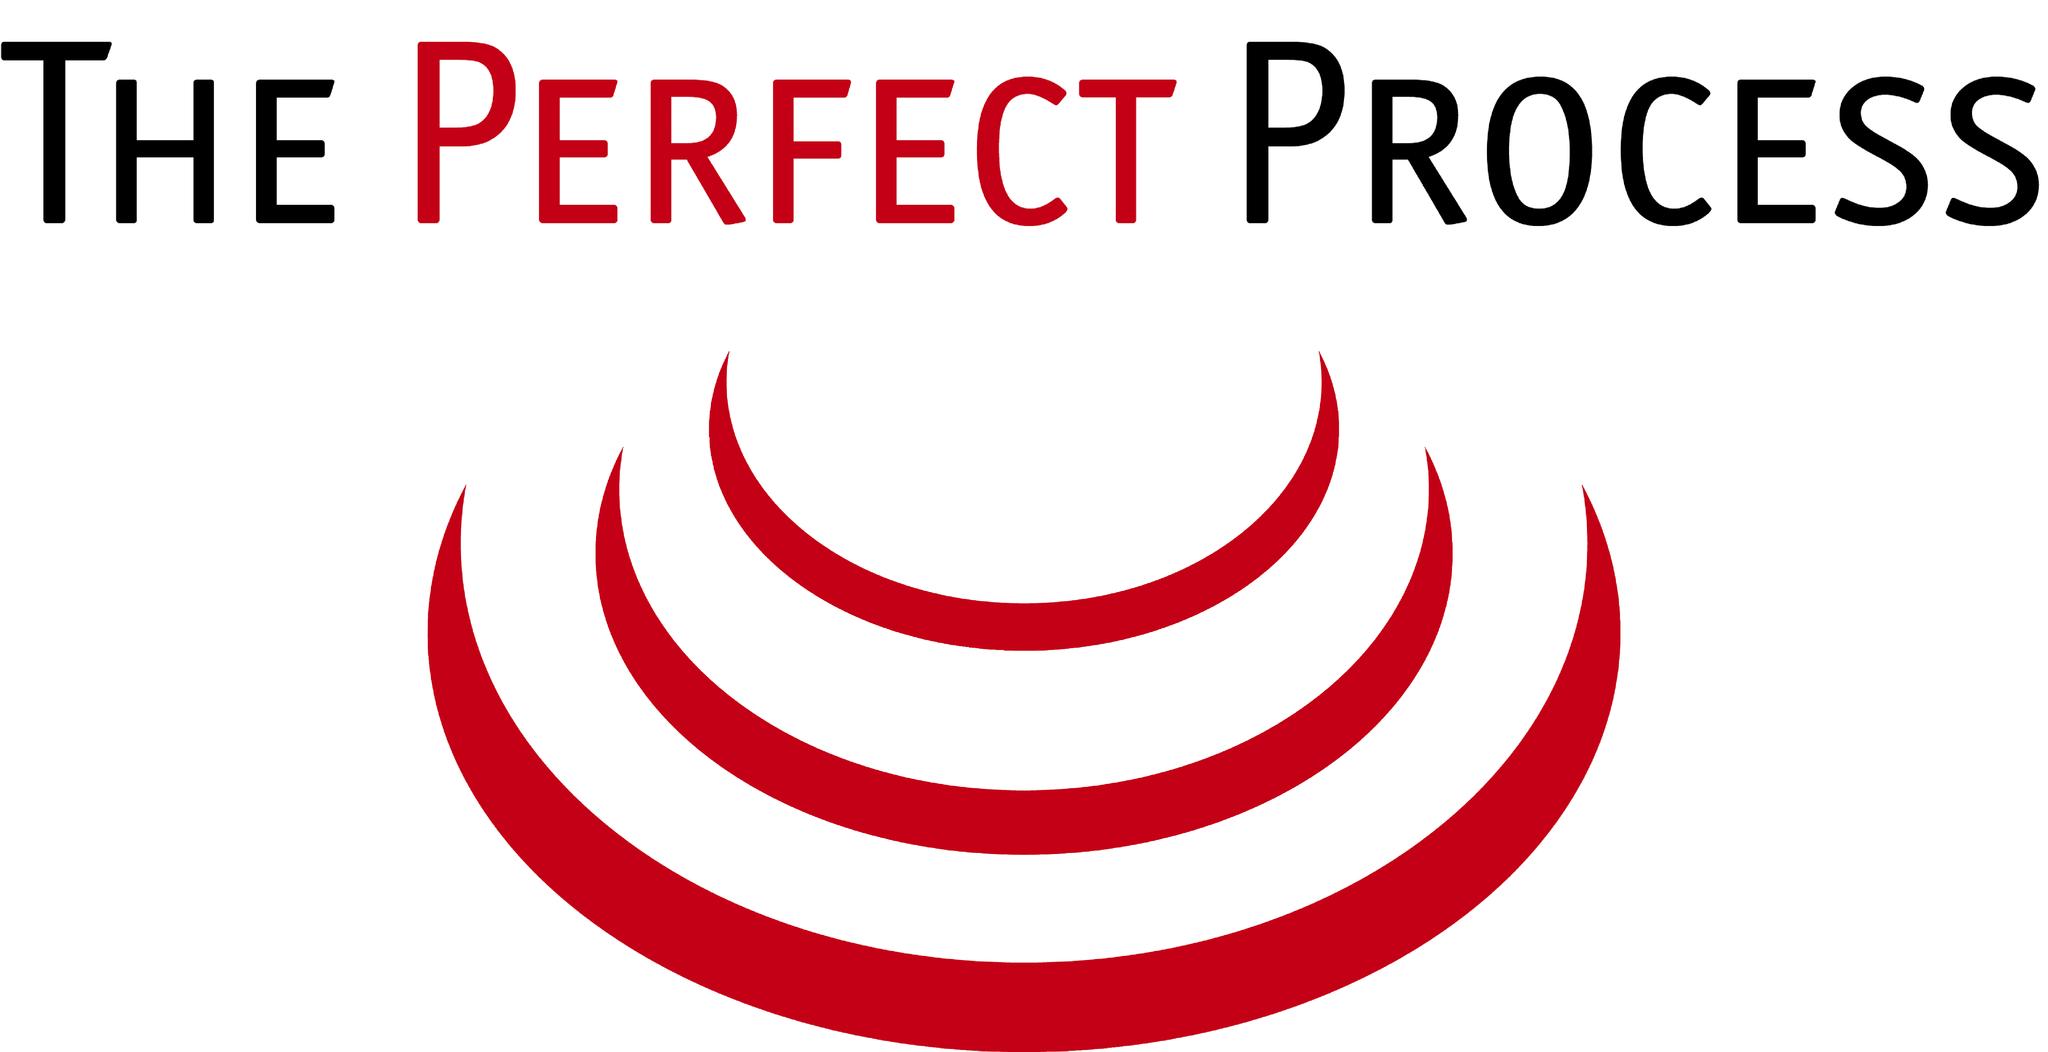 THE PERFECT PROCESS COMPANY